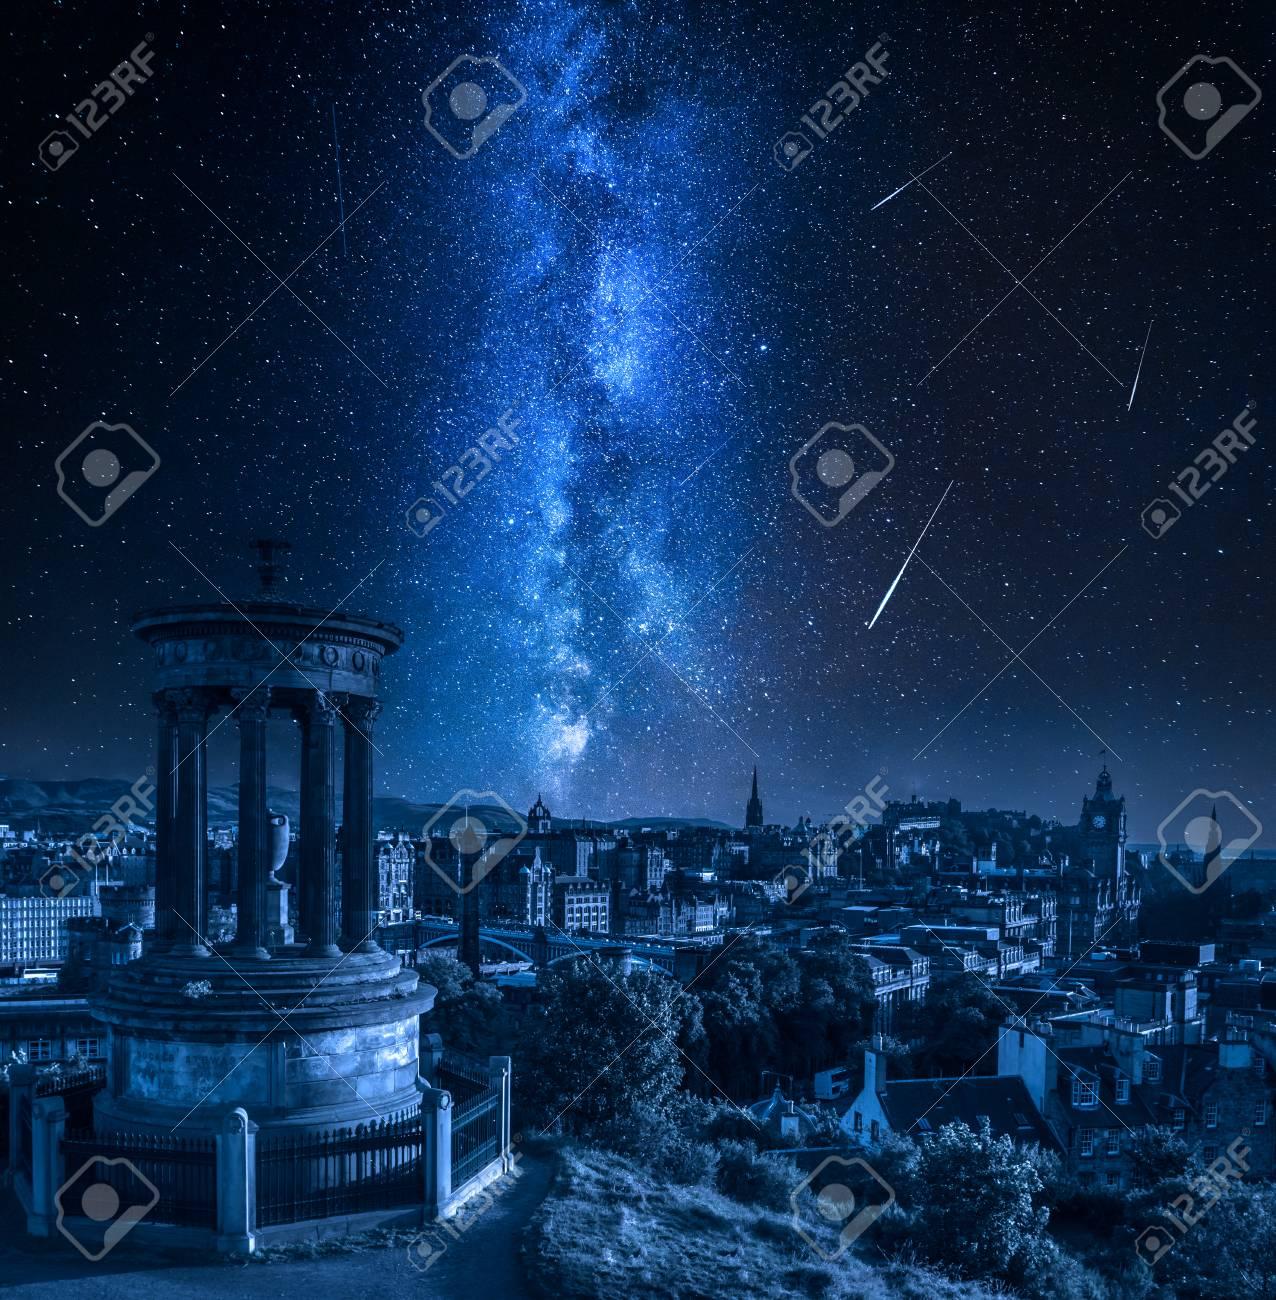 Edinburgh at night with milky way and falling stars, Scotland - 109887398